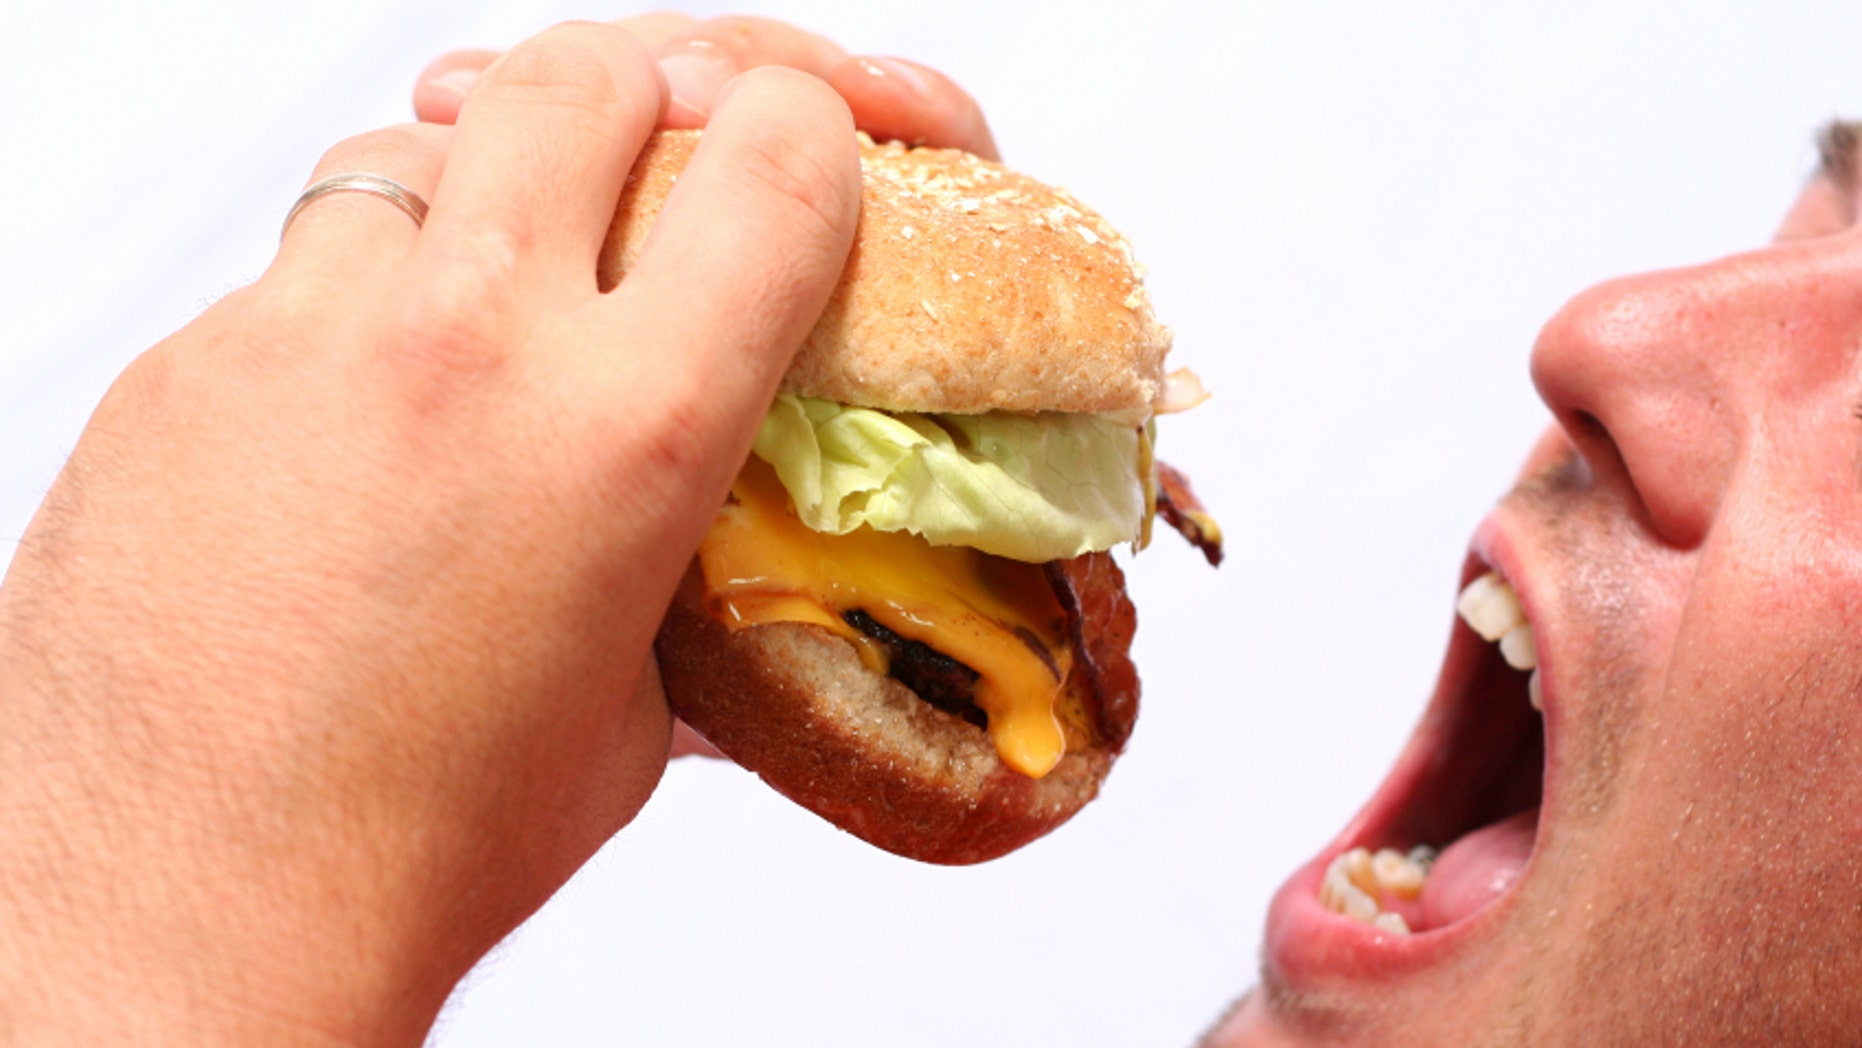 Men do eat faster than women.